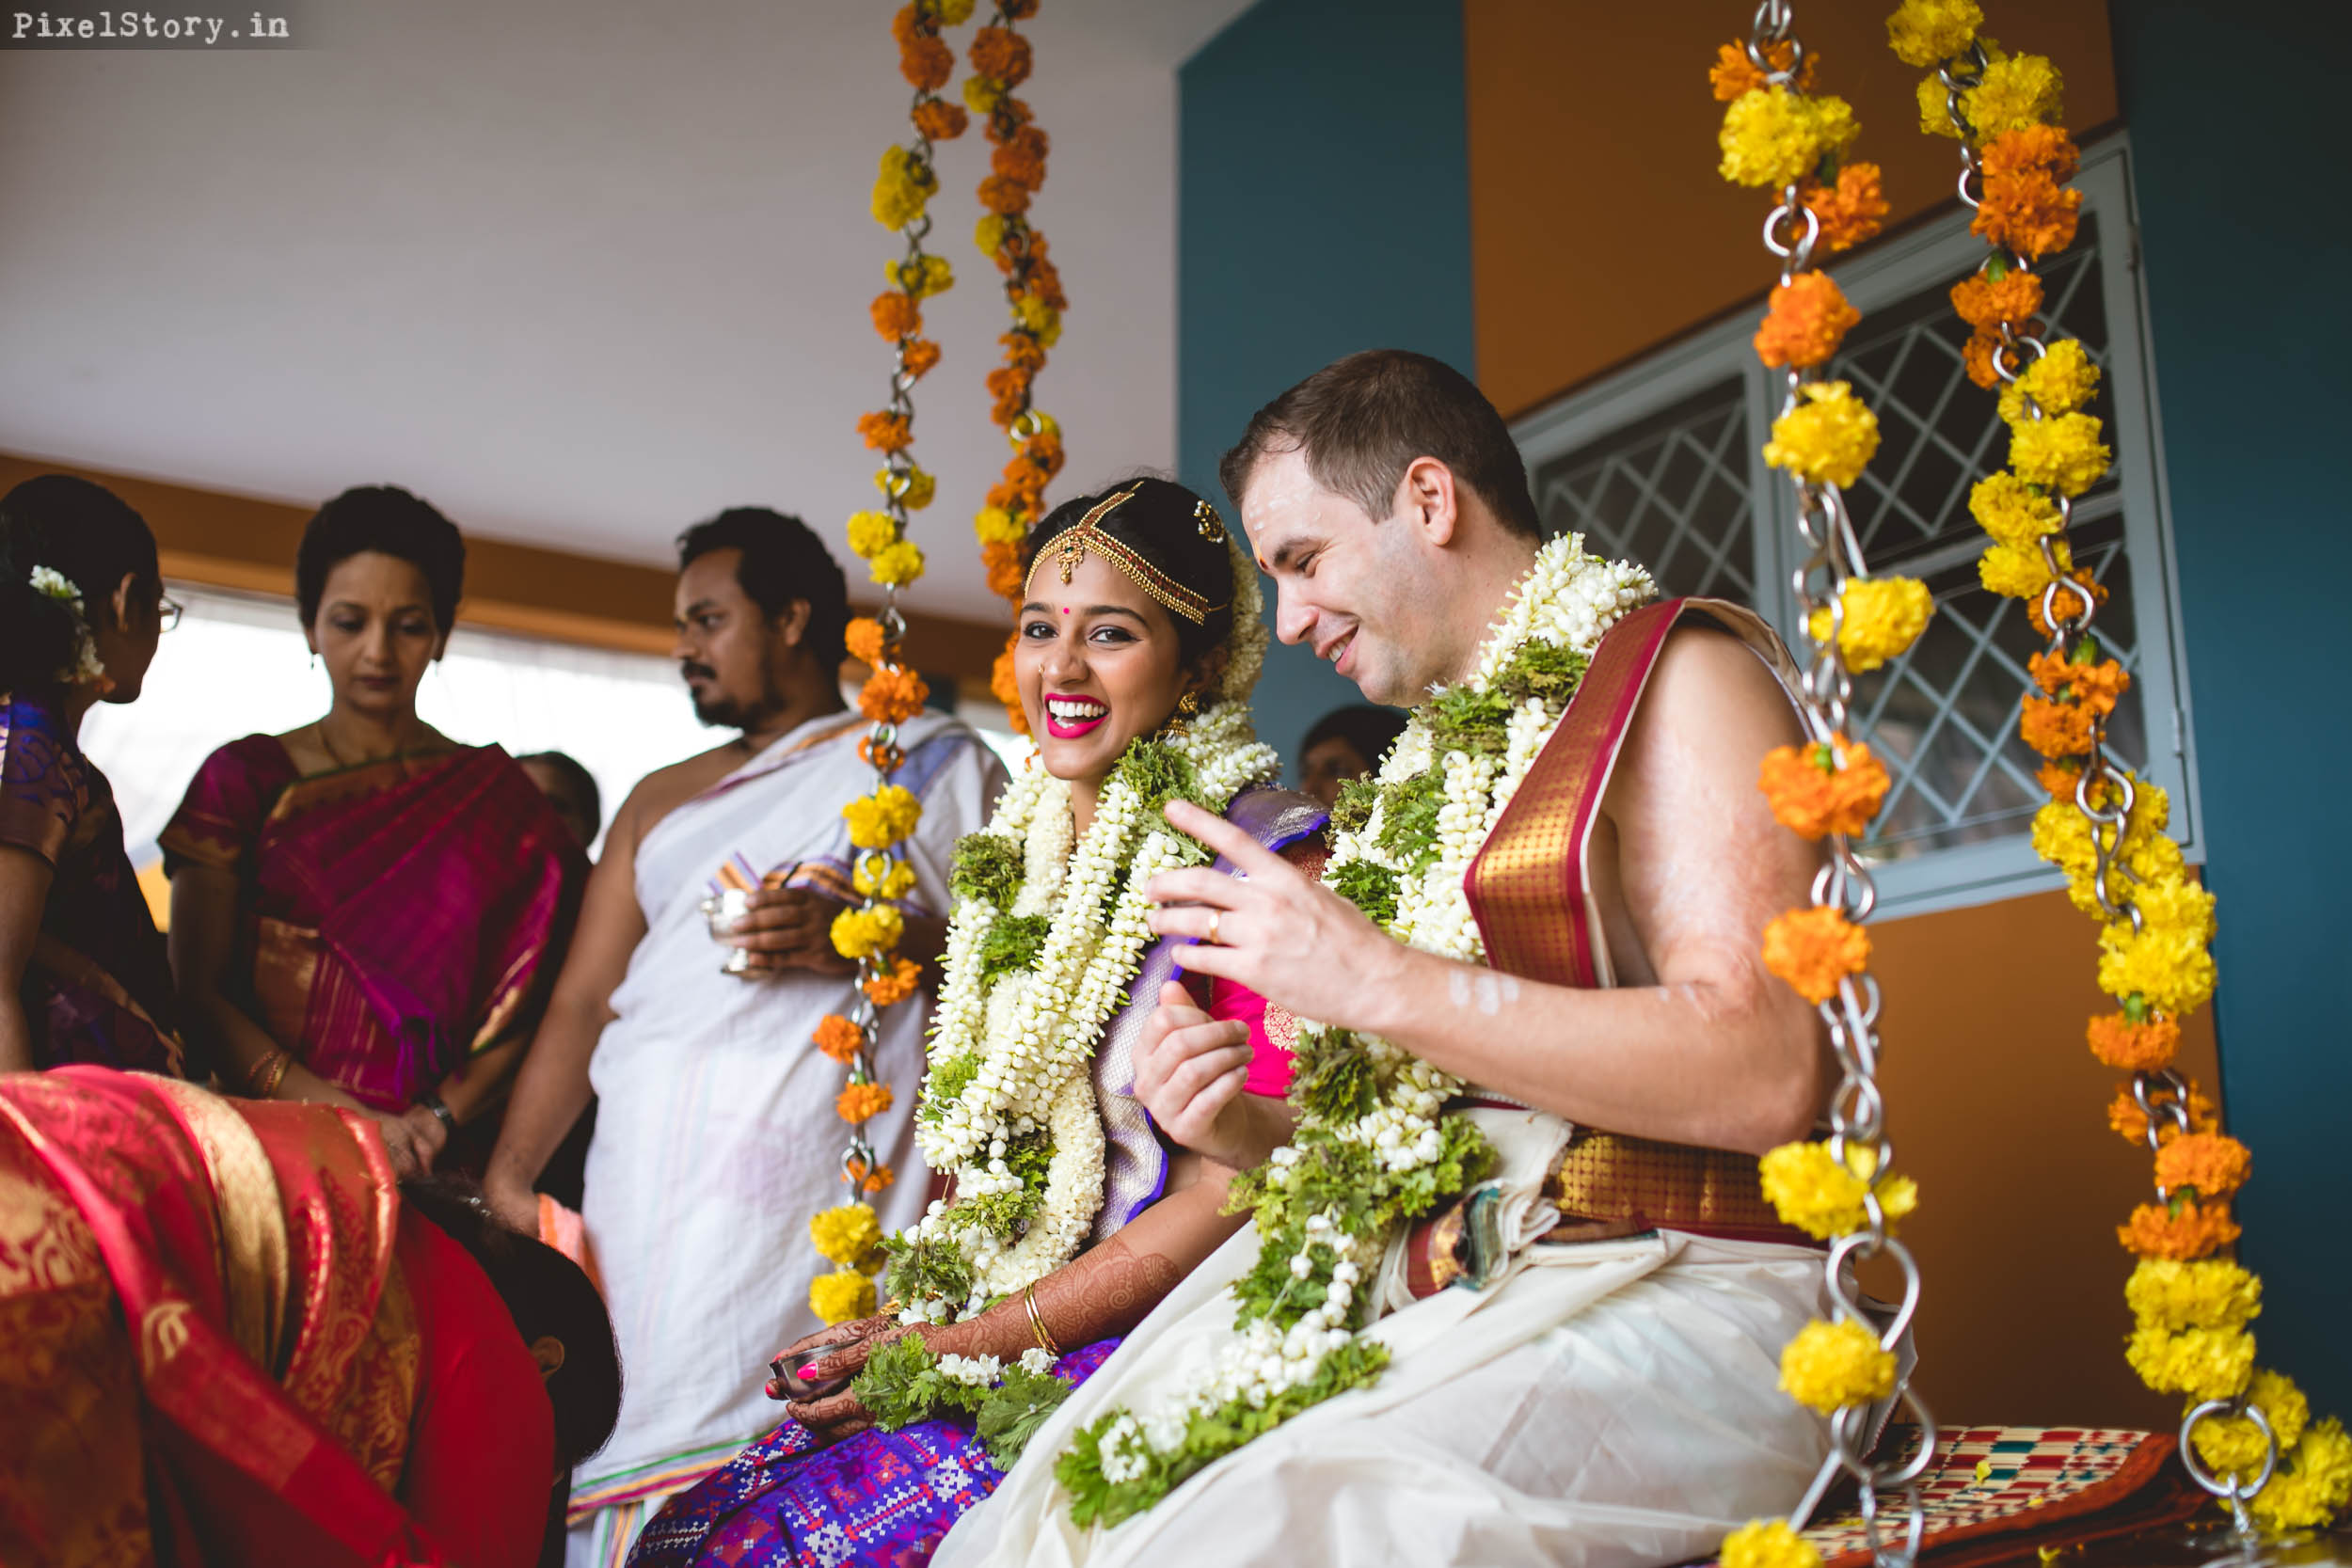 PixelStory-Jungle-Wedding-Photographer-Masinagudi-Indo-French037.jpg